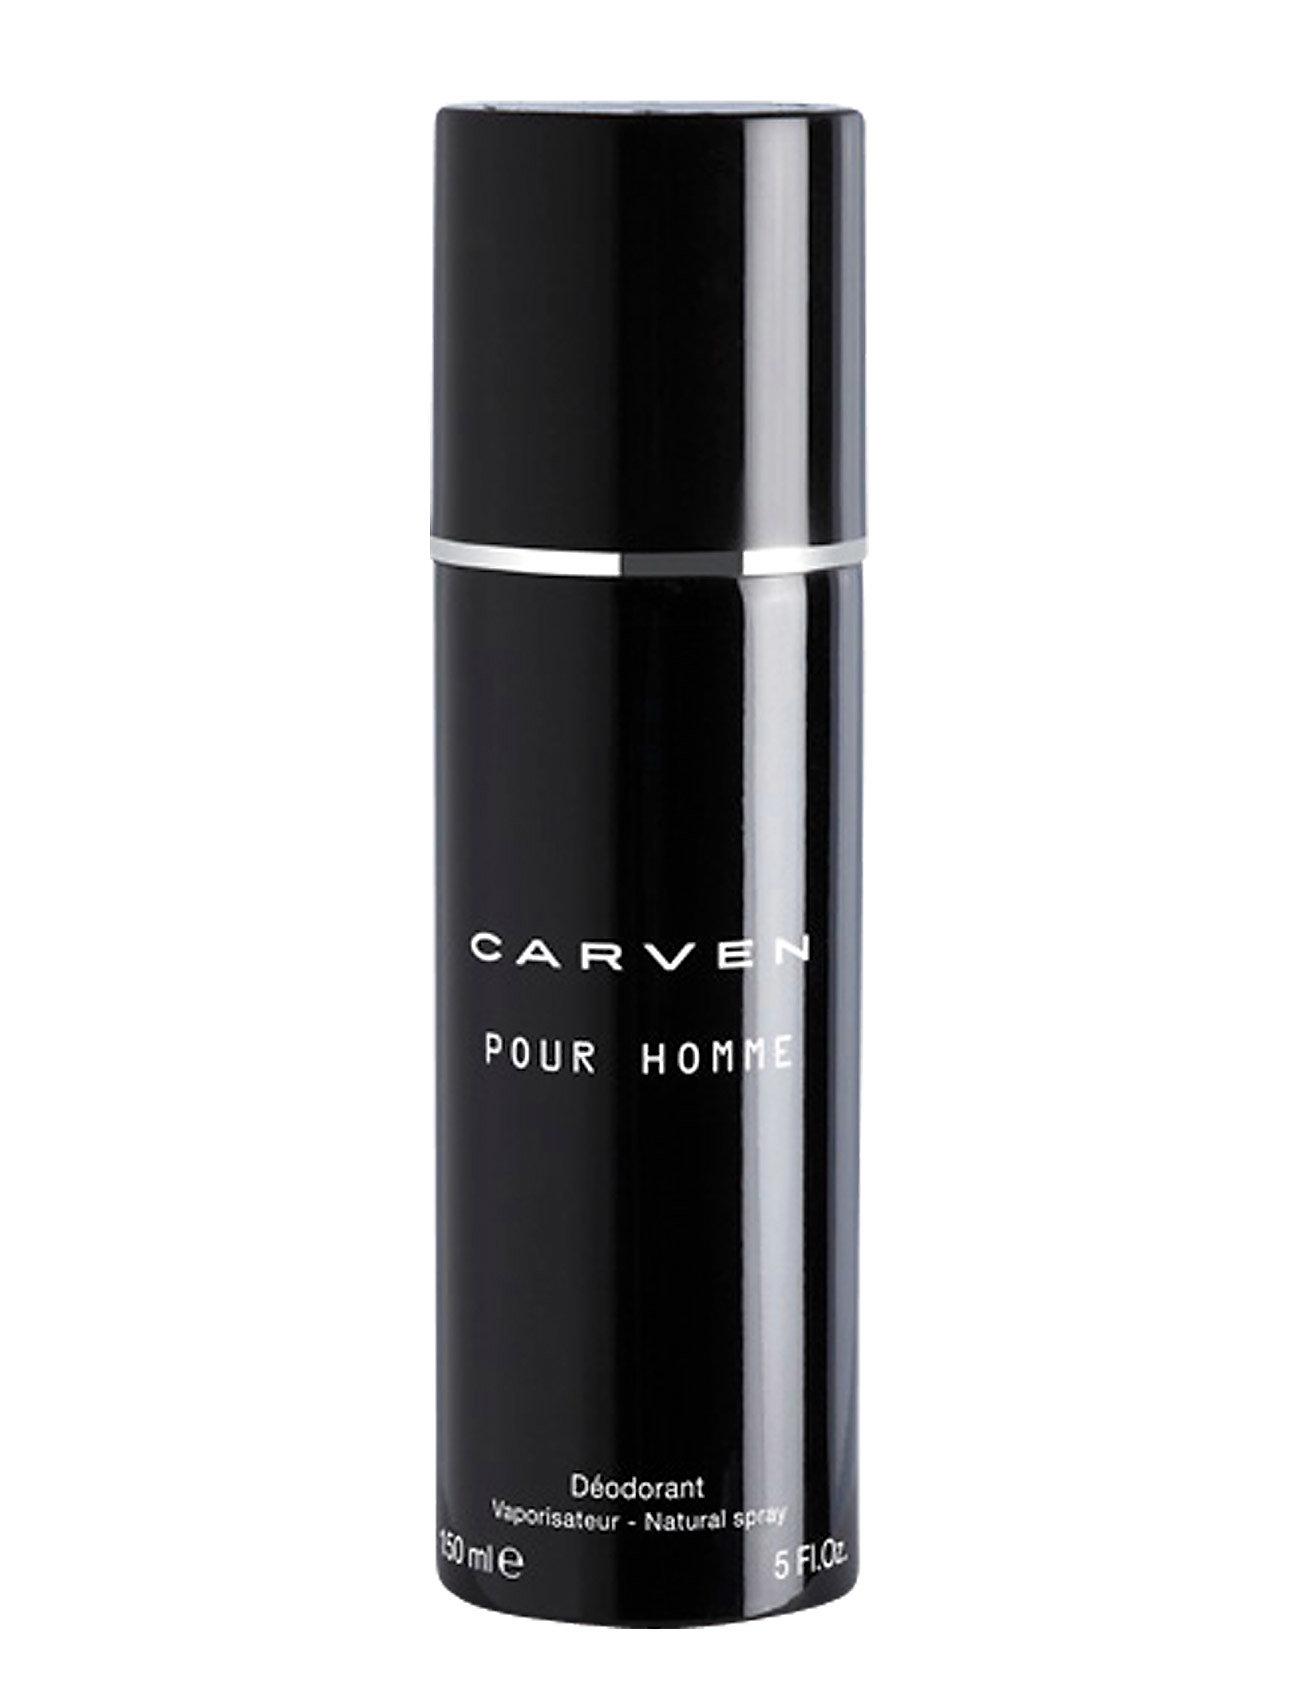 Carven Pour Homme Deodorant 150mL - CLEAR